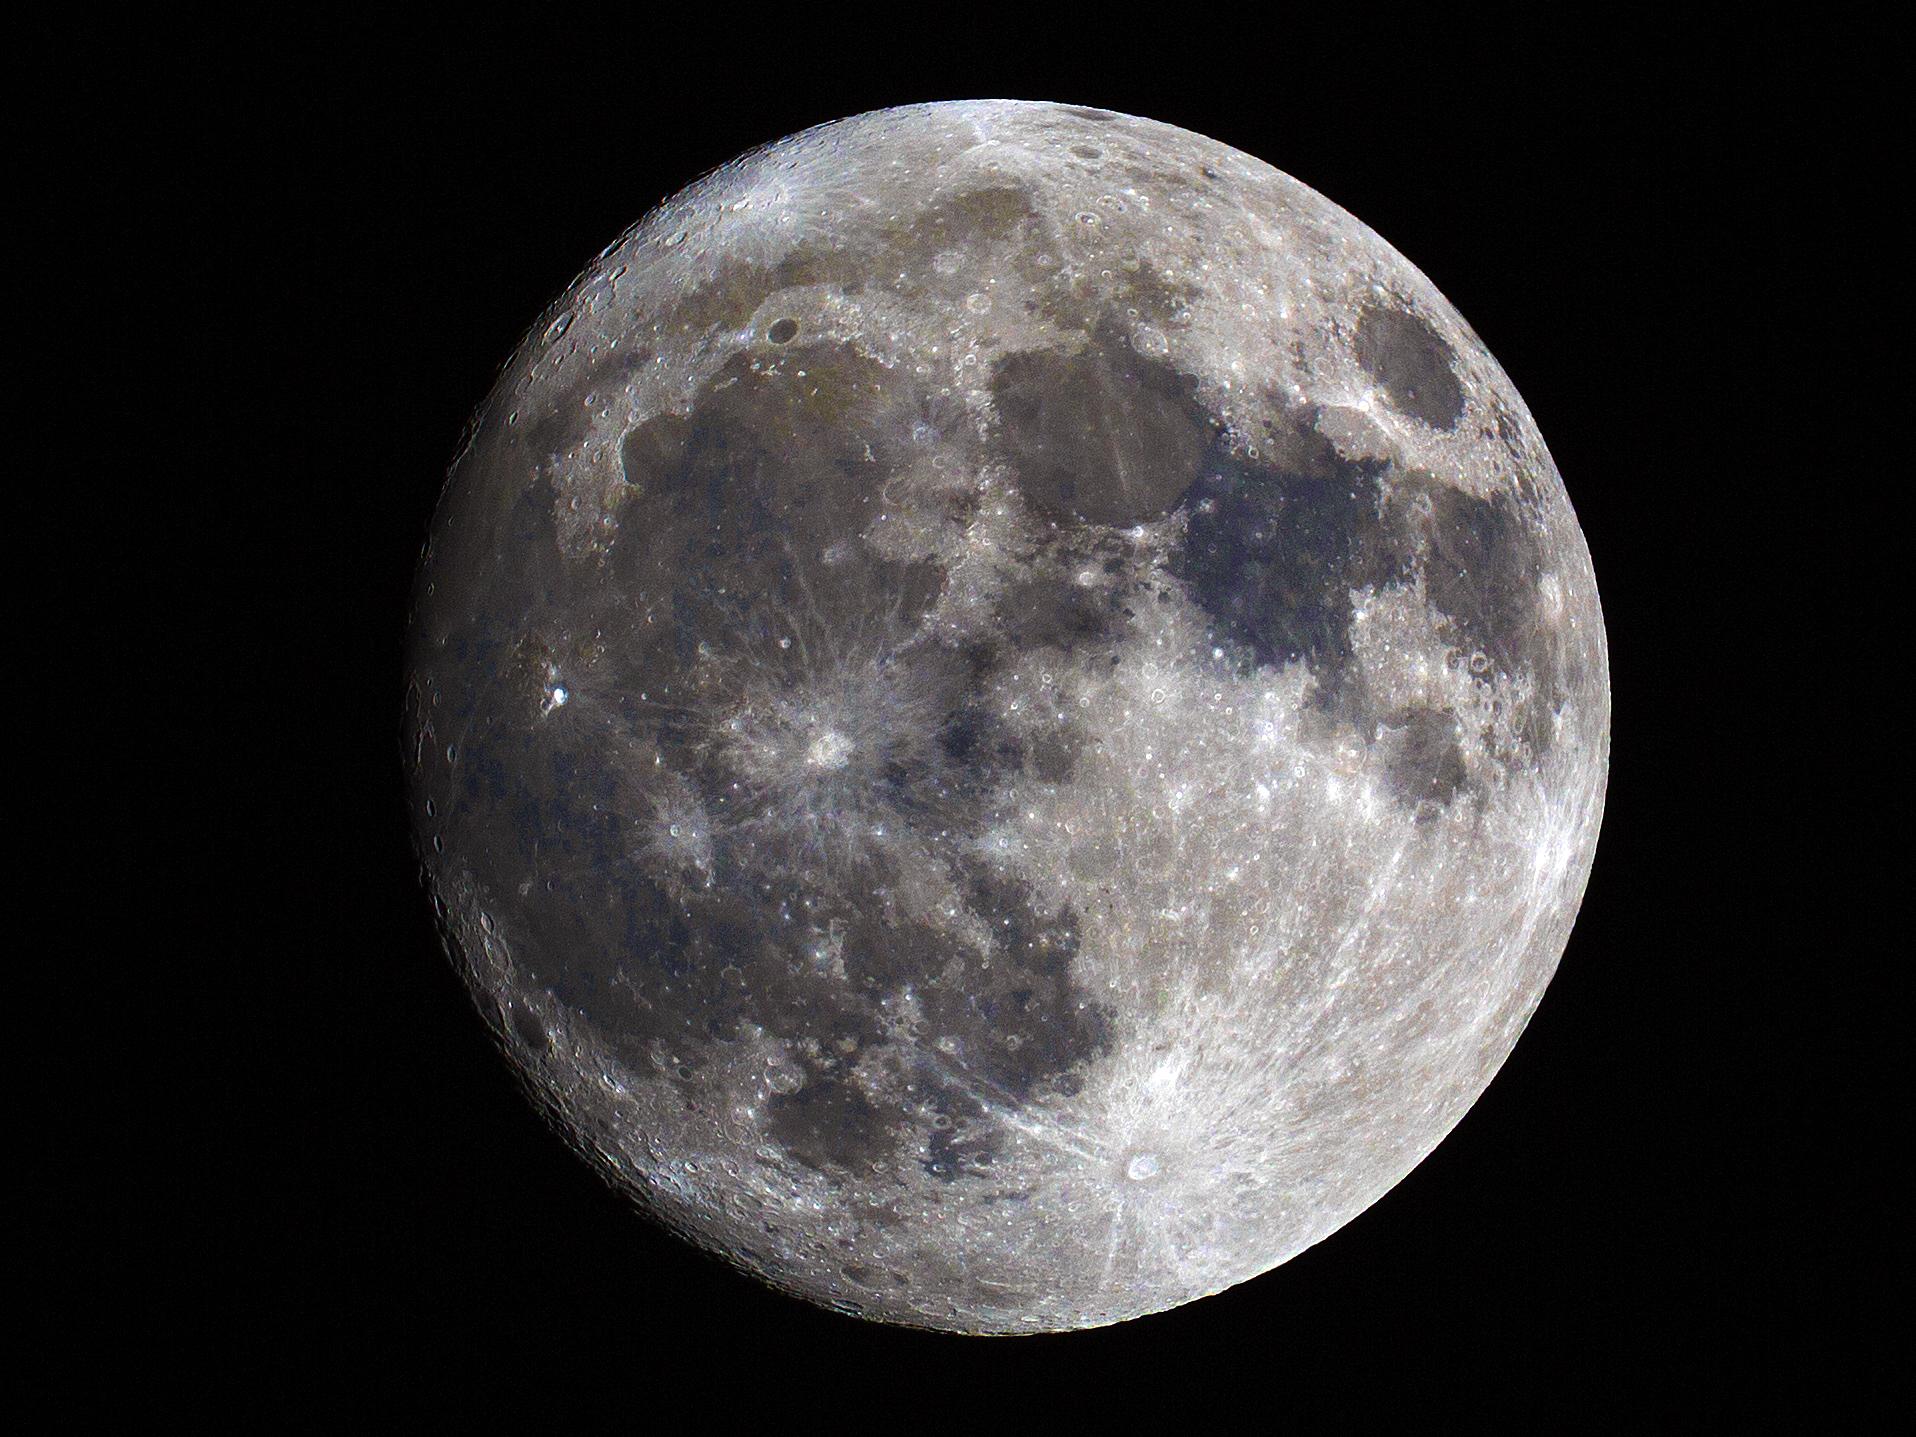 2017-11-02 moon_2_840mm_color enhanced.jpg